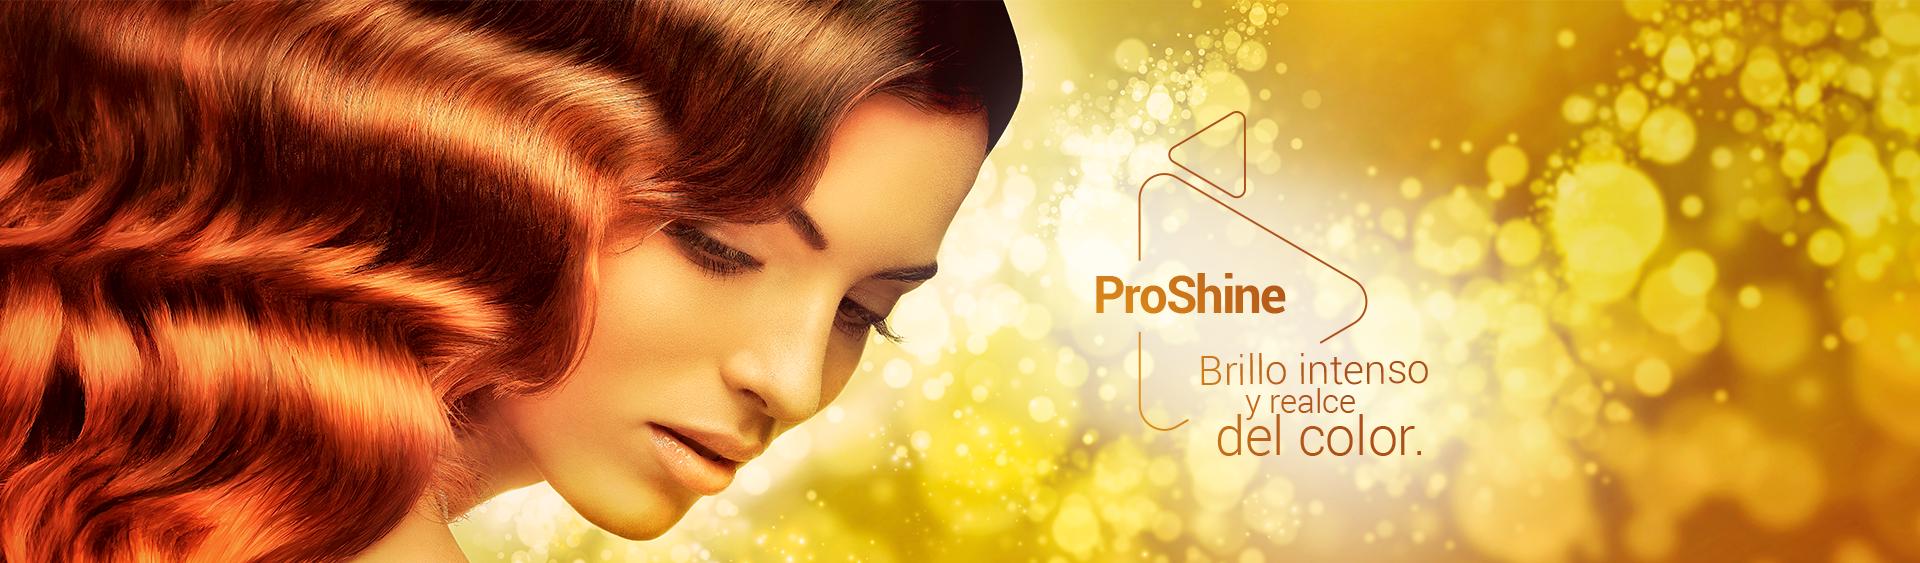 Lanzamiento ProShine